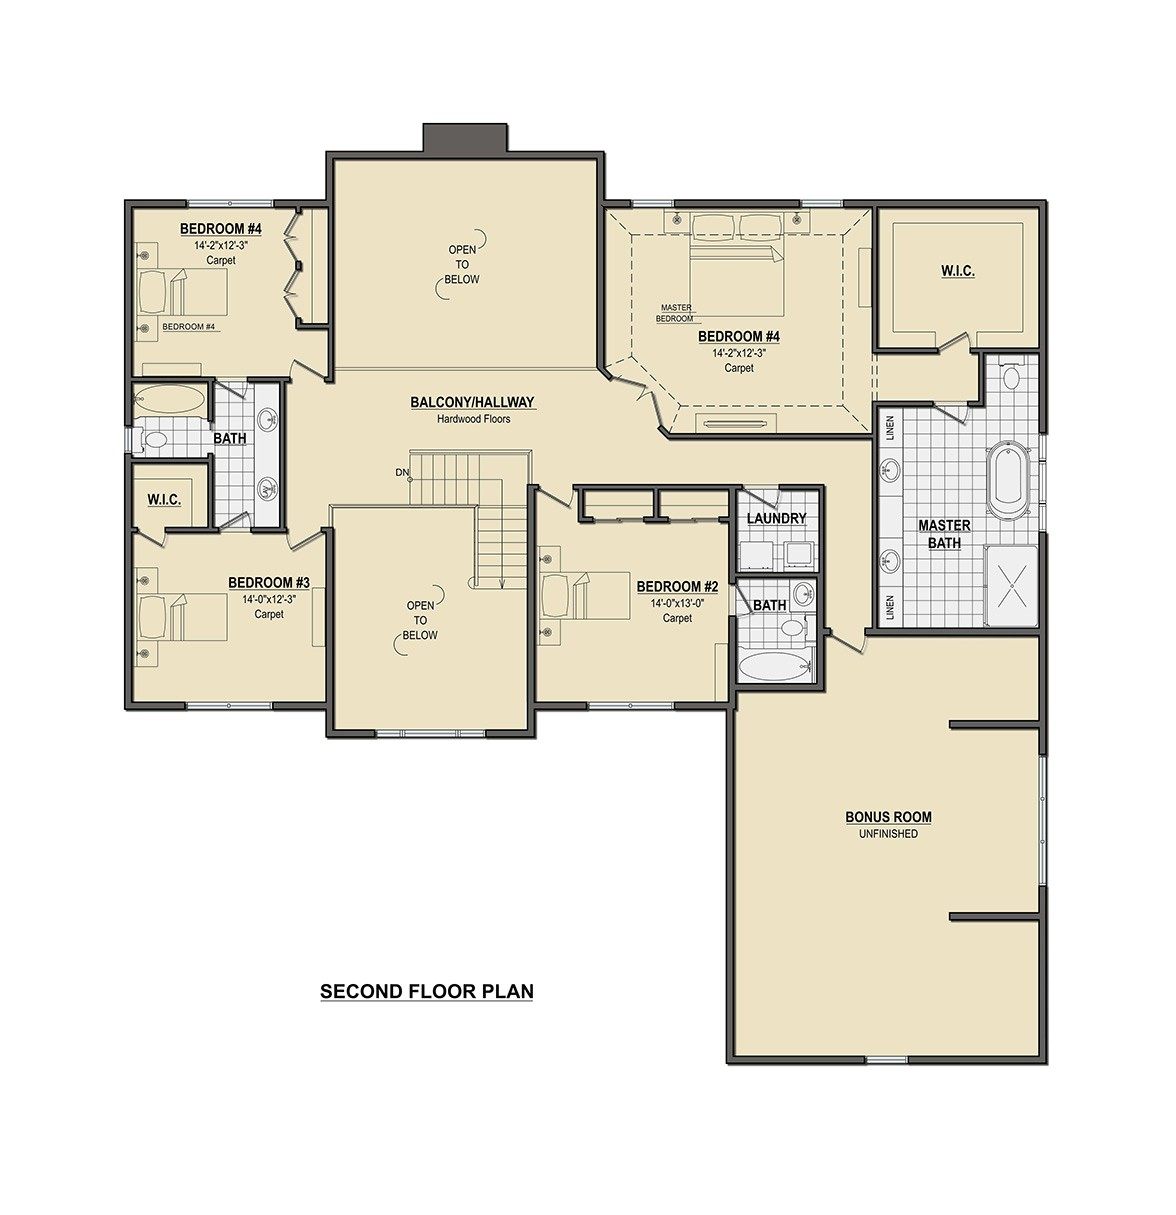 floorplan barlow 2nd 2